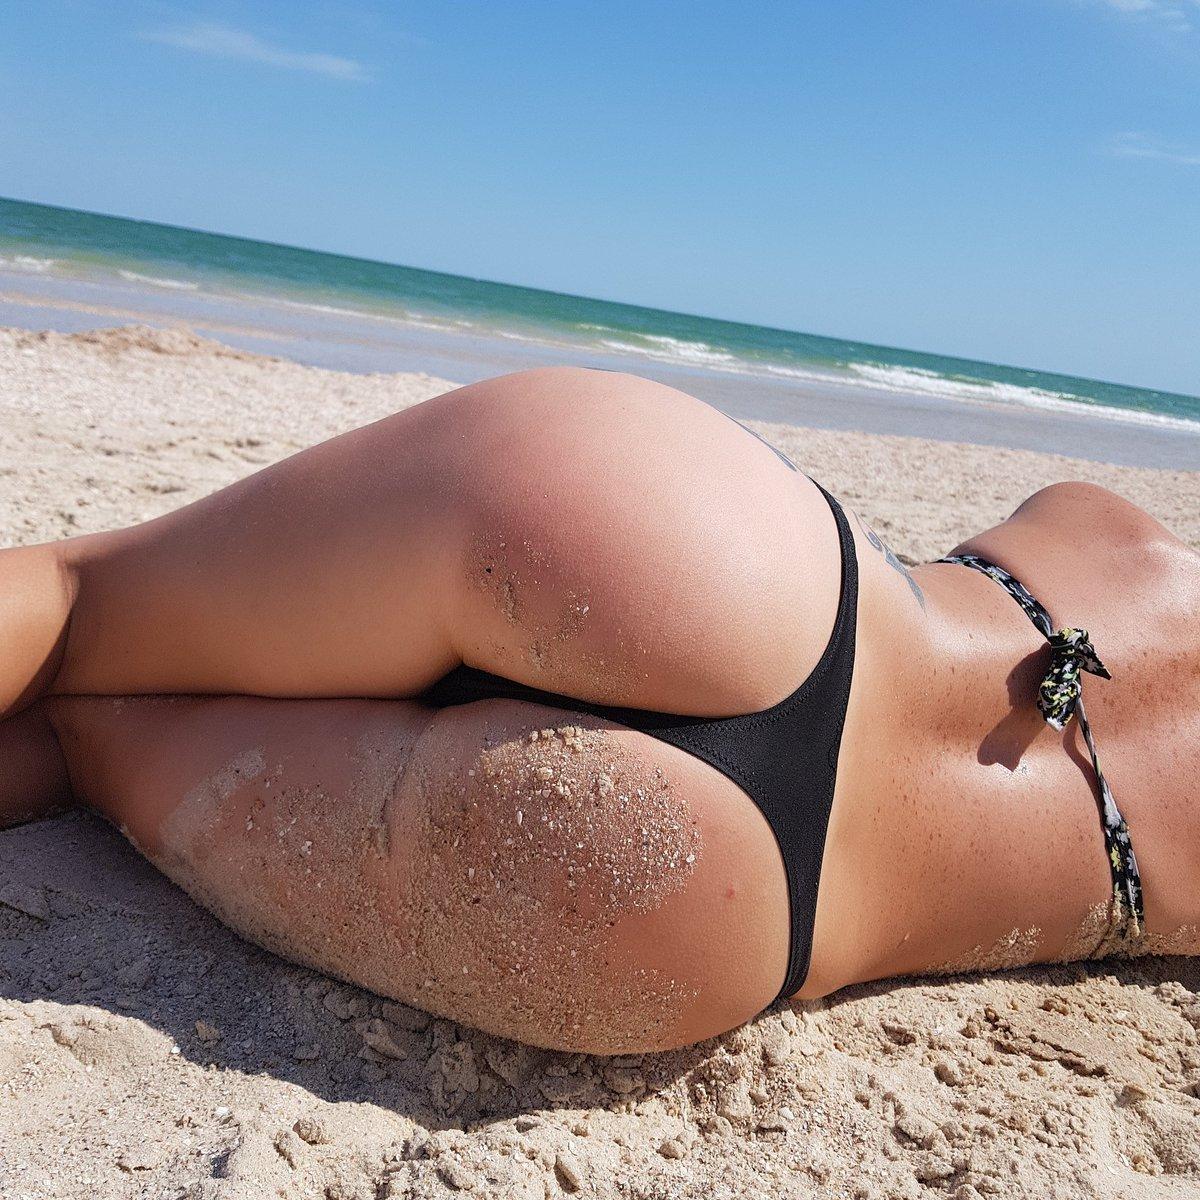 nipple slip bikini tumblr